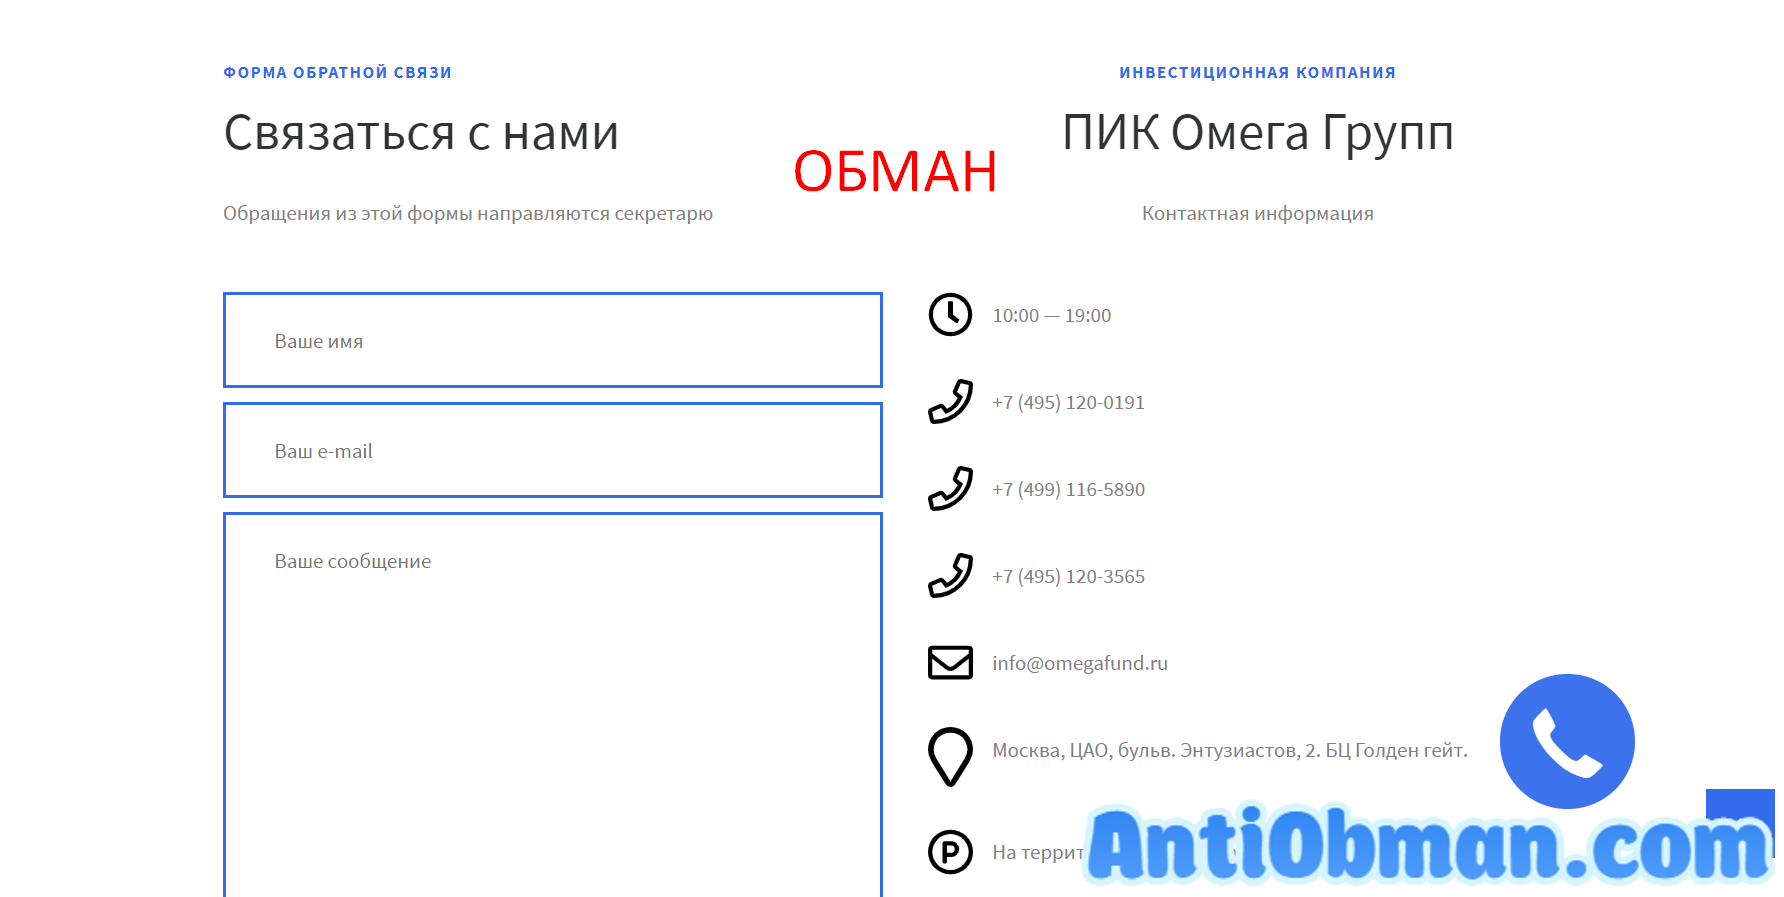 Omega Group - отзывы о компании omegafund.ru. Развод?